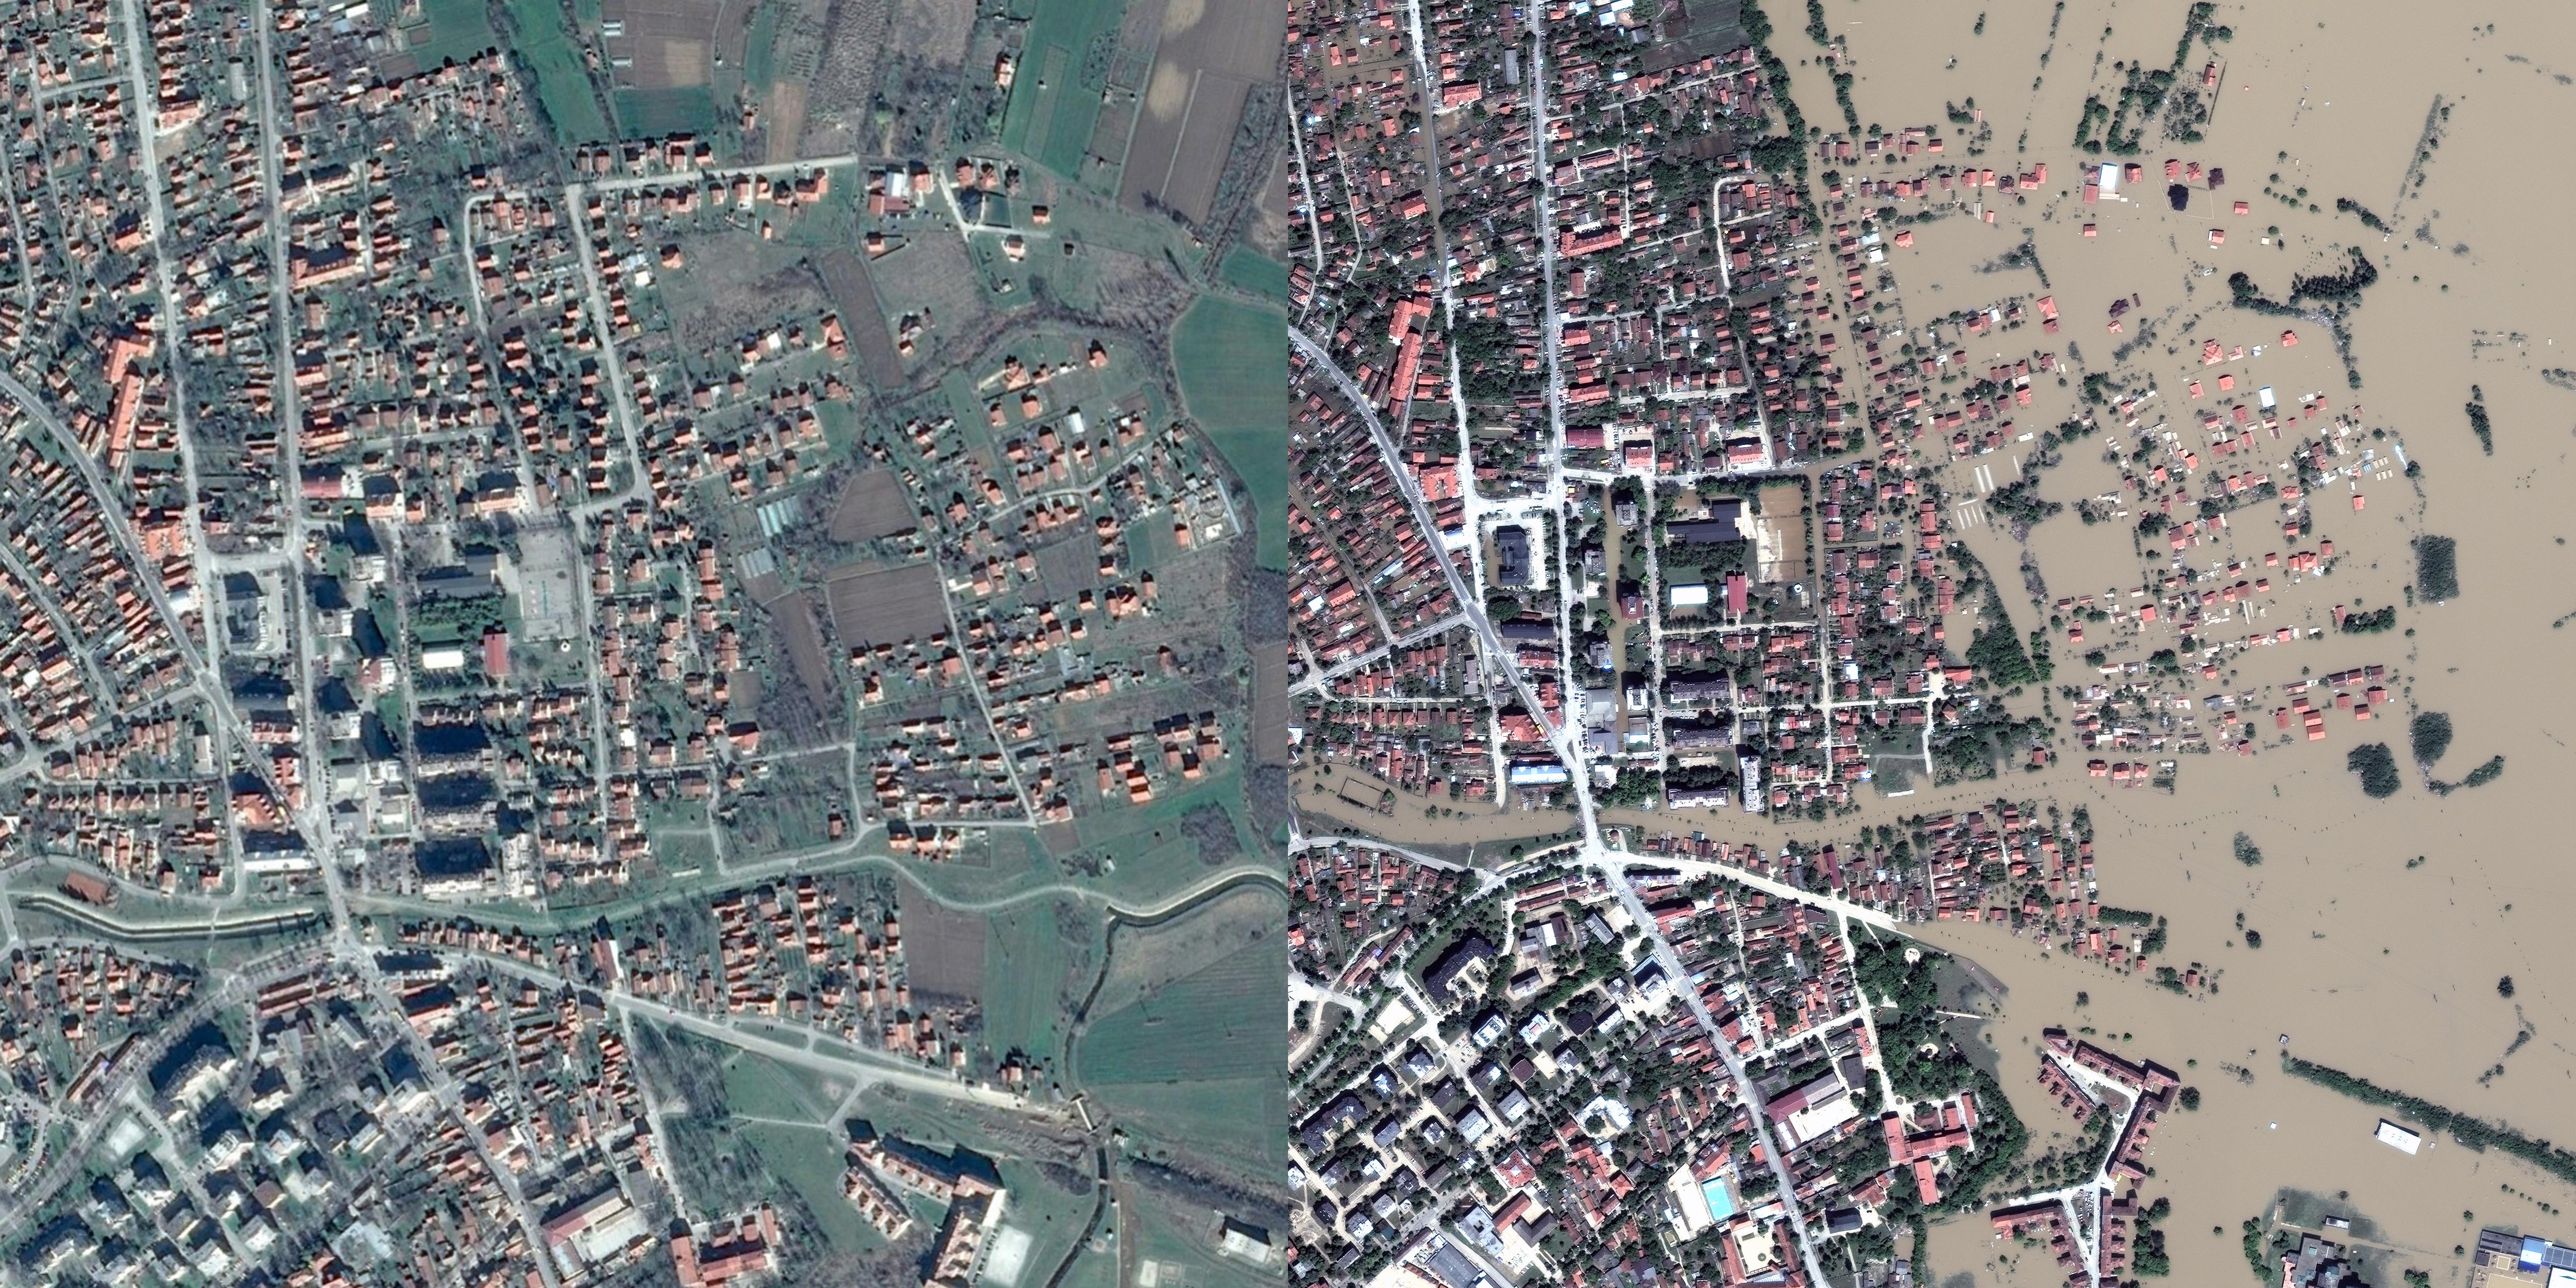 Left: Obrenovac, Serbia before the floods.                                                              Right: Obrenovac, Serbia May 21, 2014.